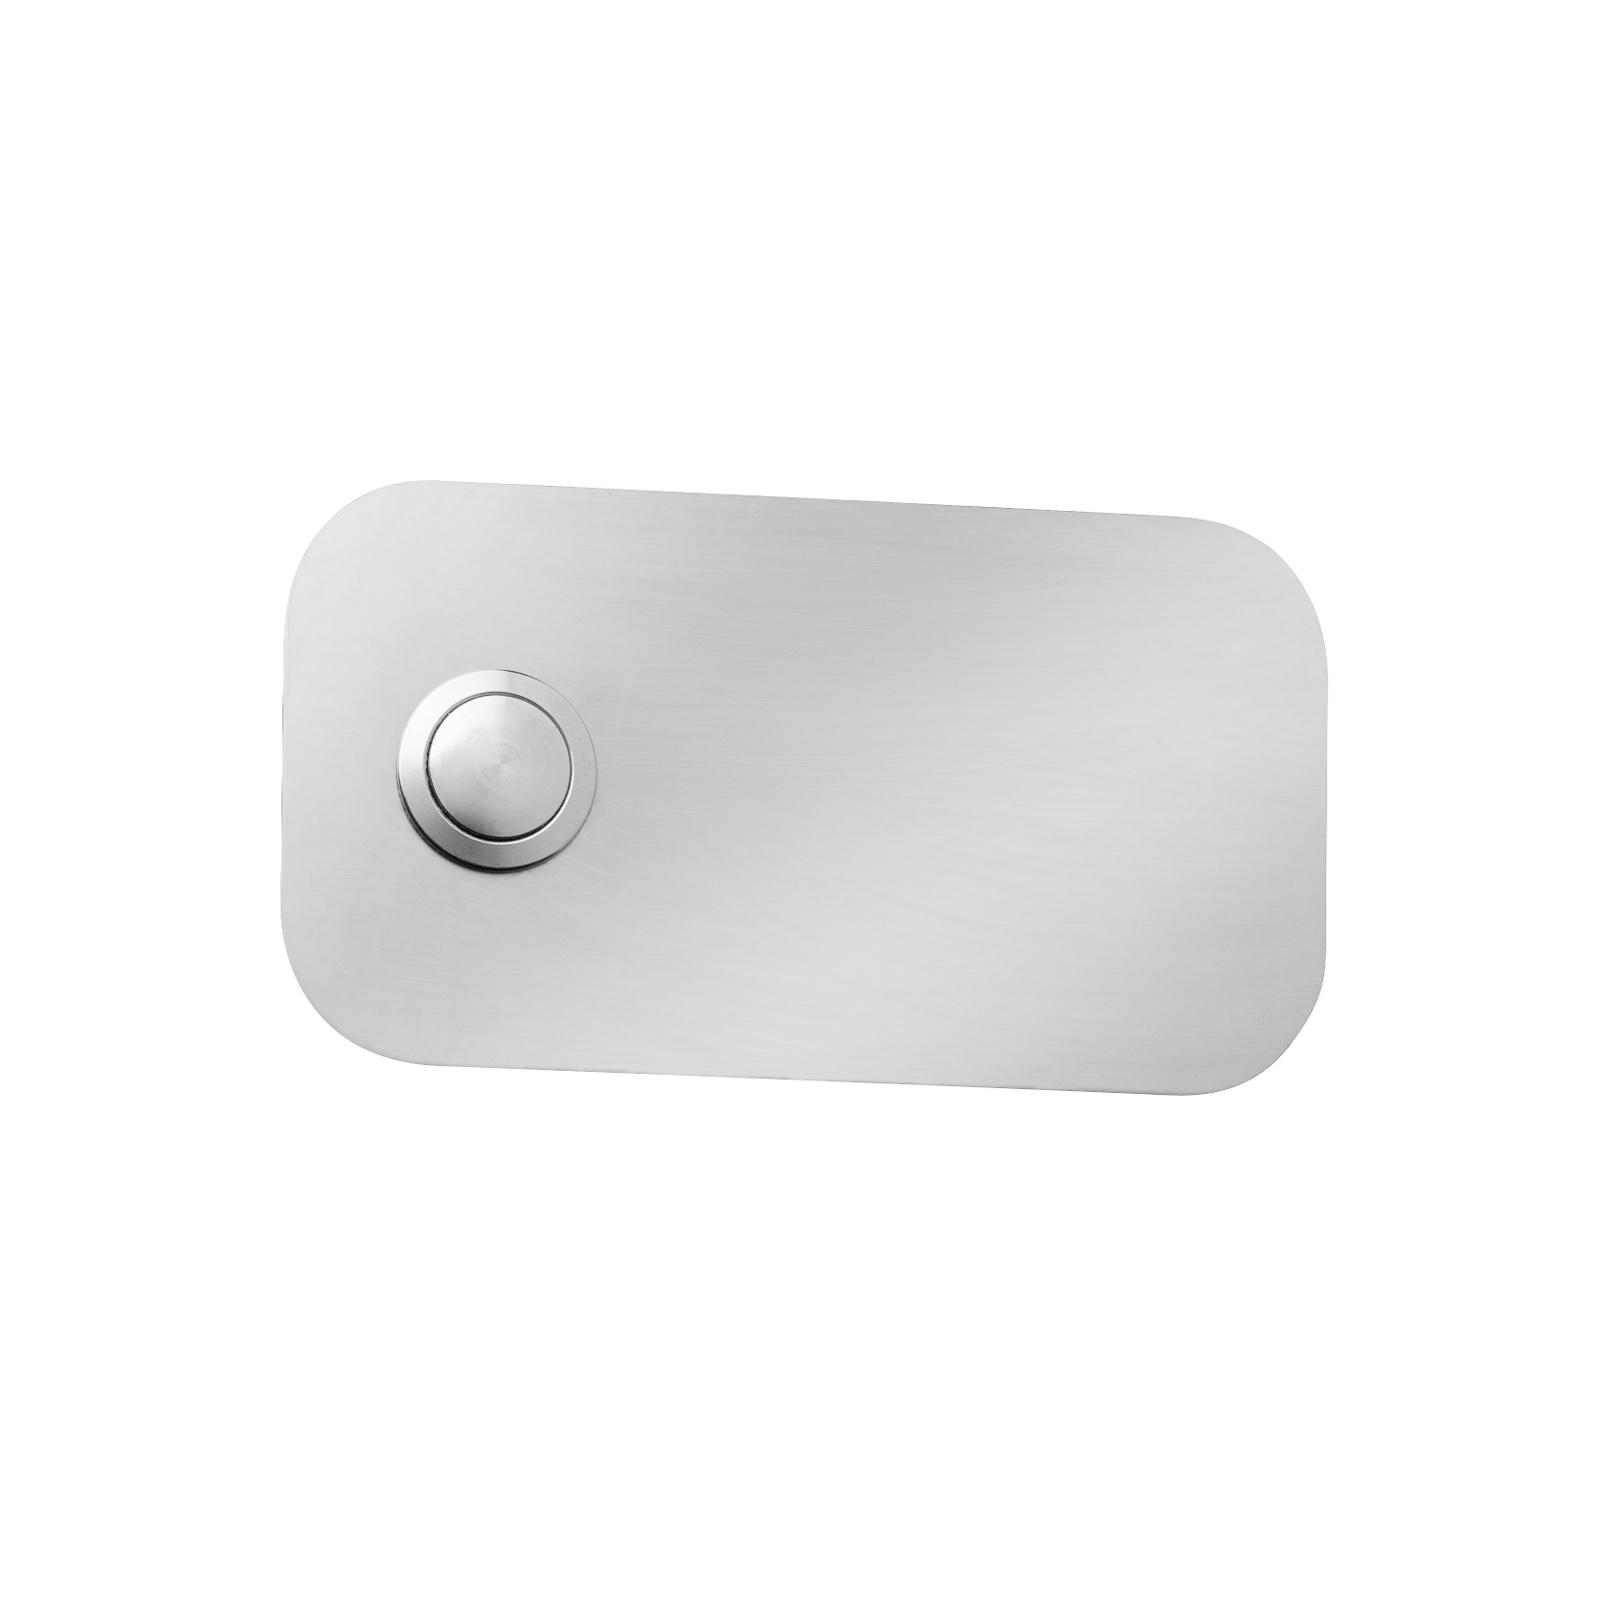 Rectangular Stainless Steel Doorbell Coverplate_2011141_1